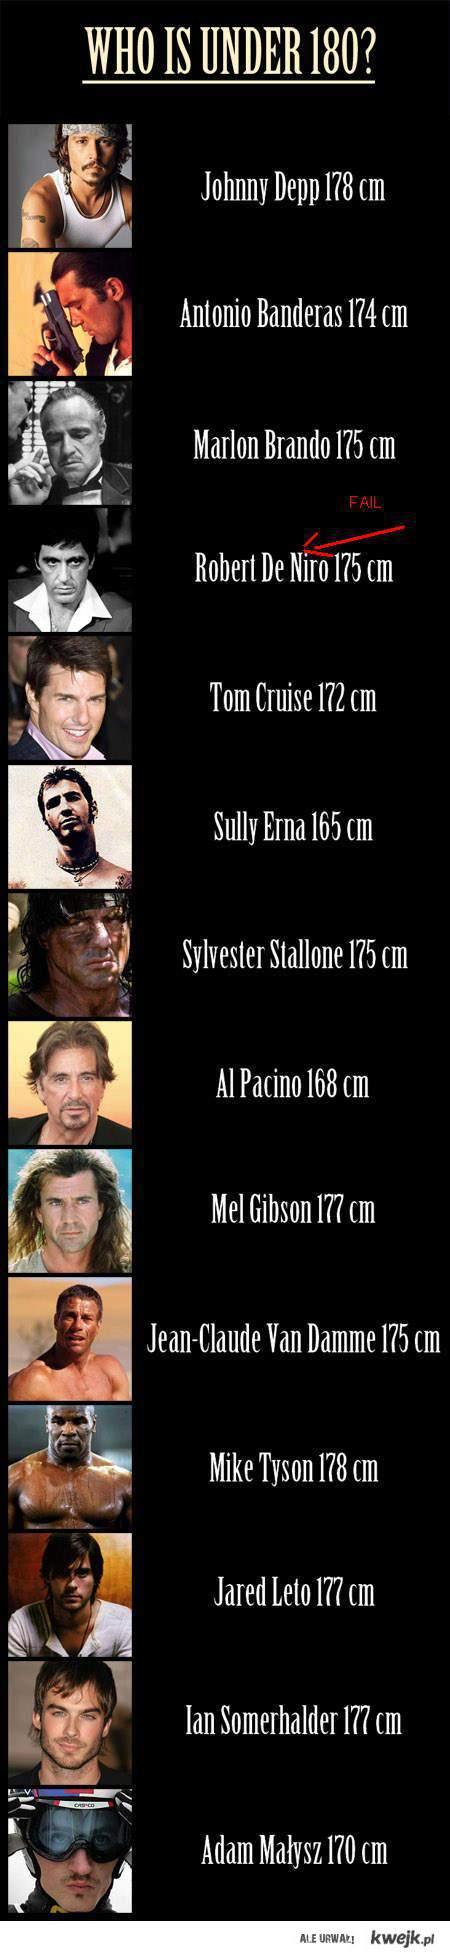 Al Pacino chyba haha